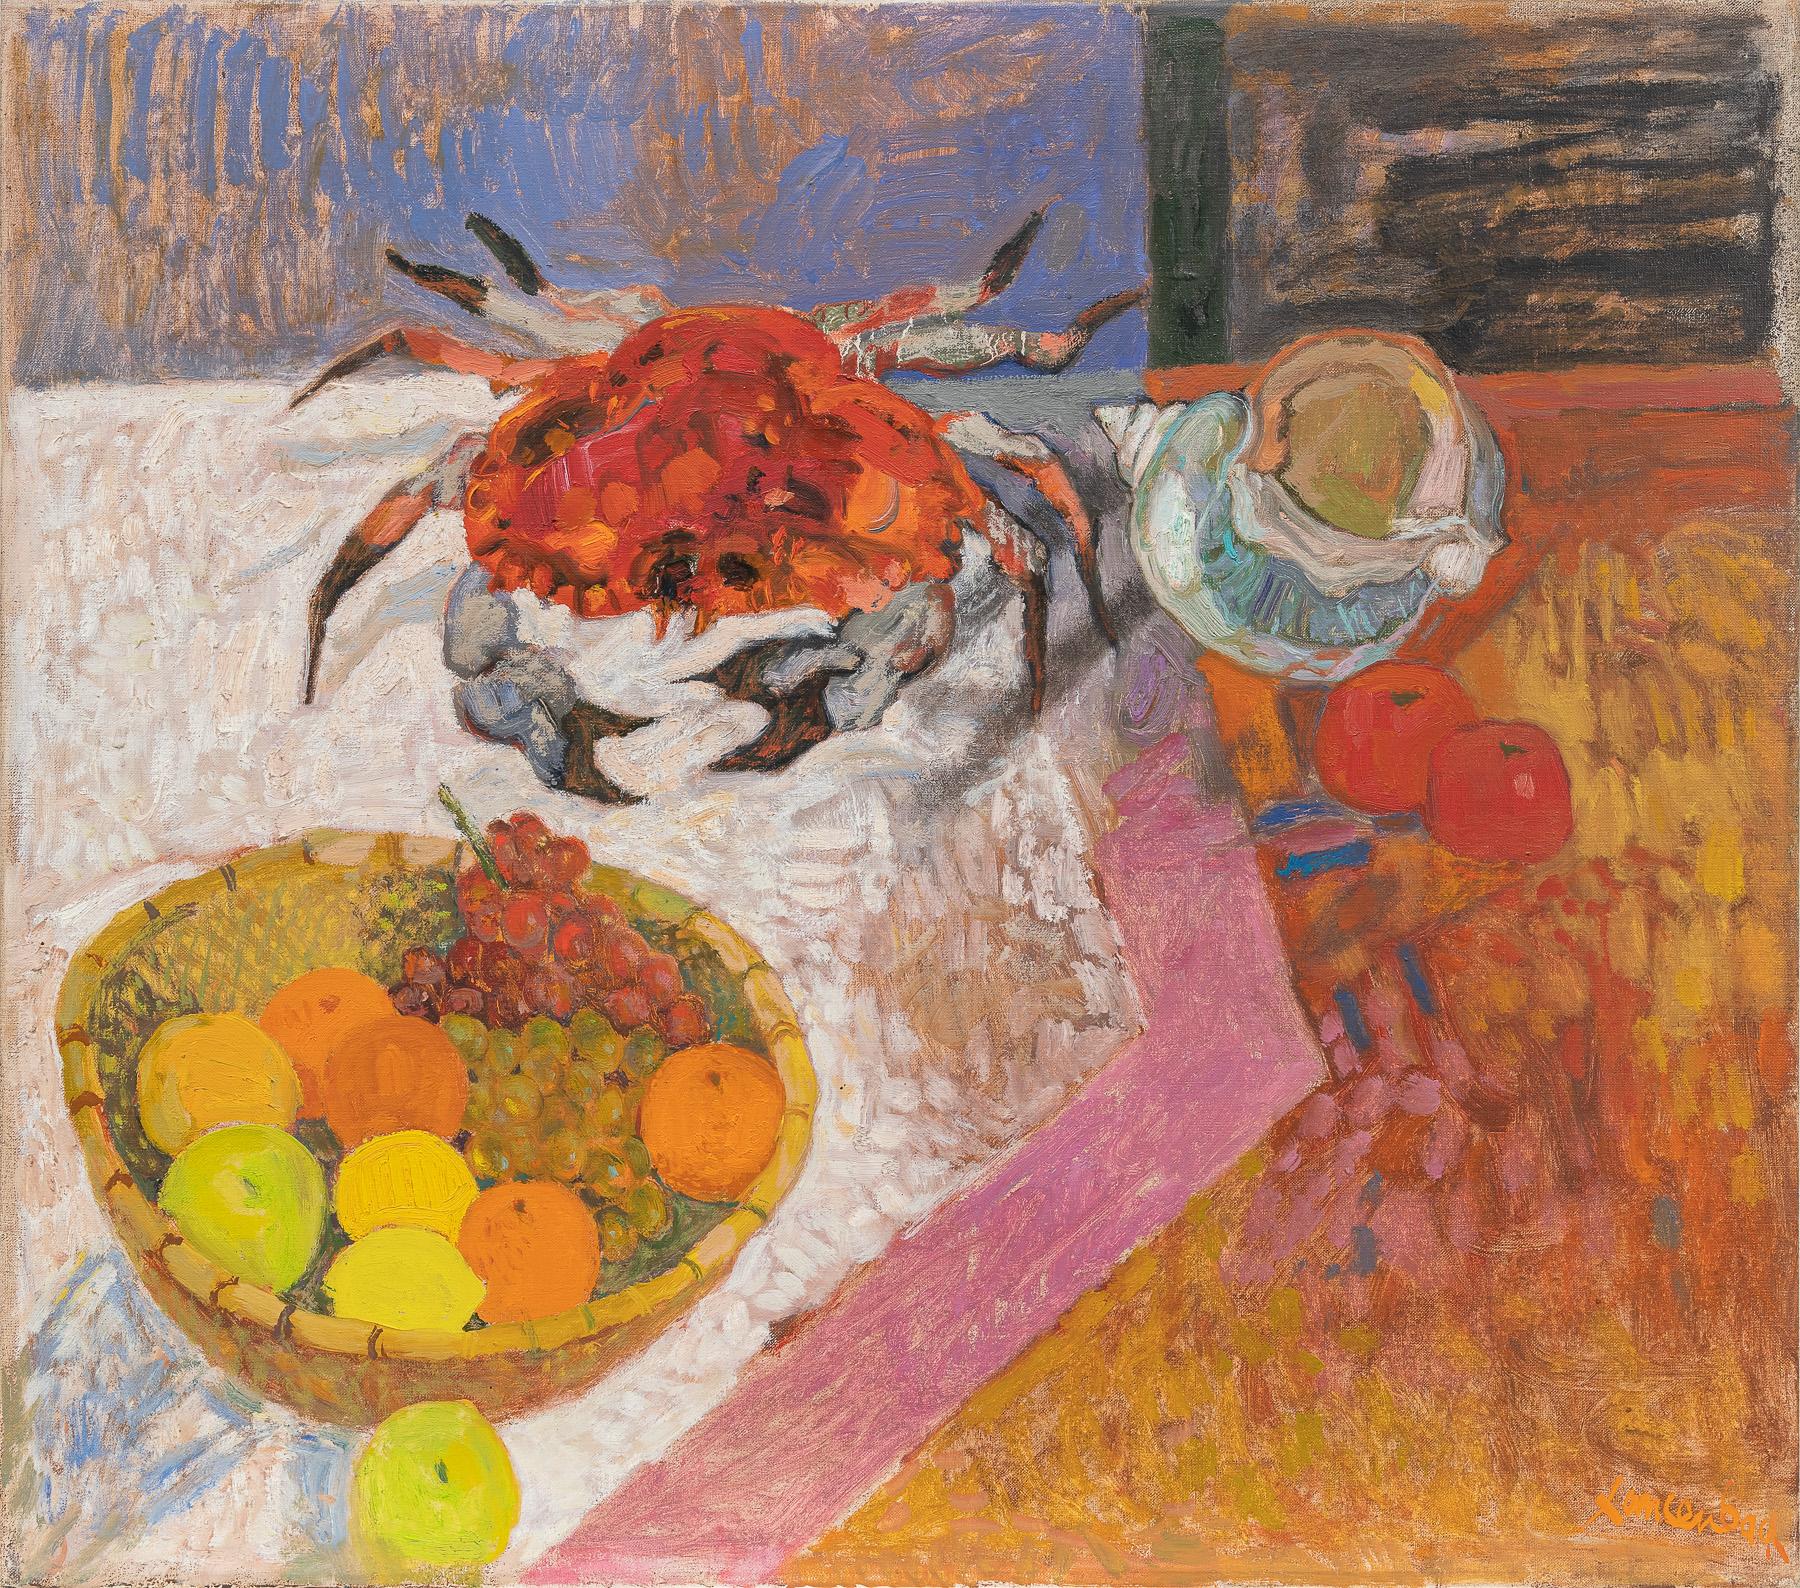 Krab i owoce, 1992